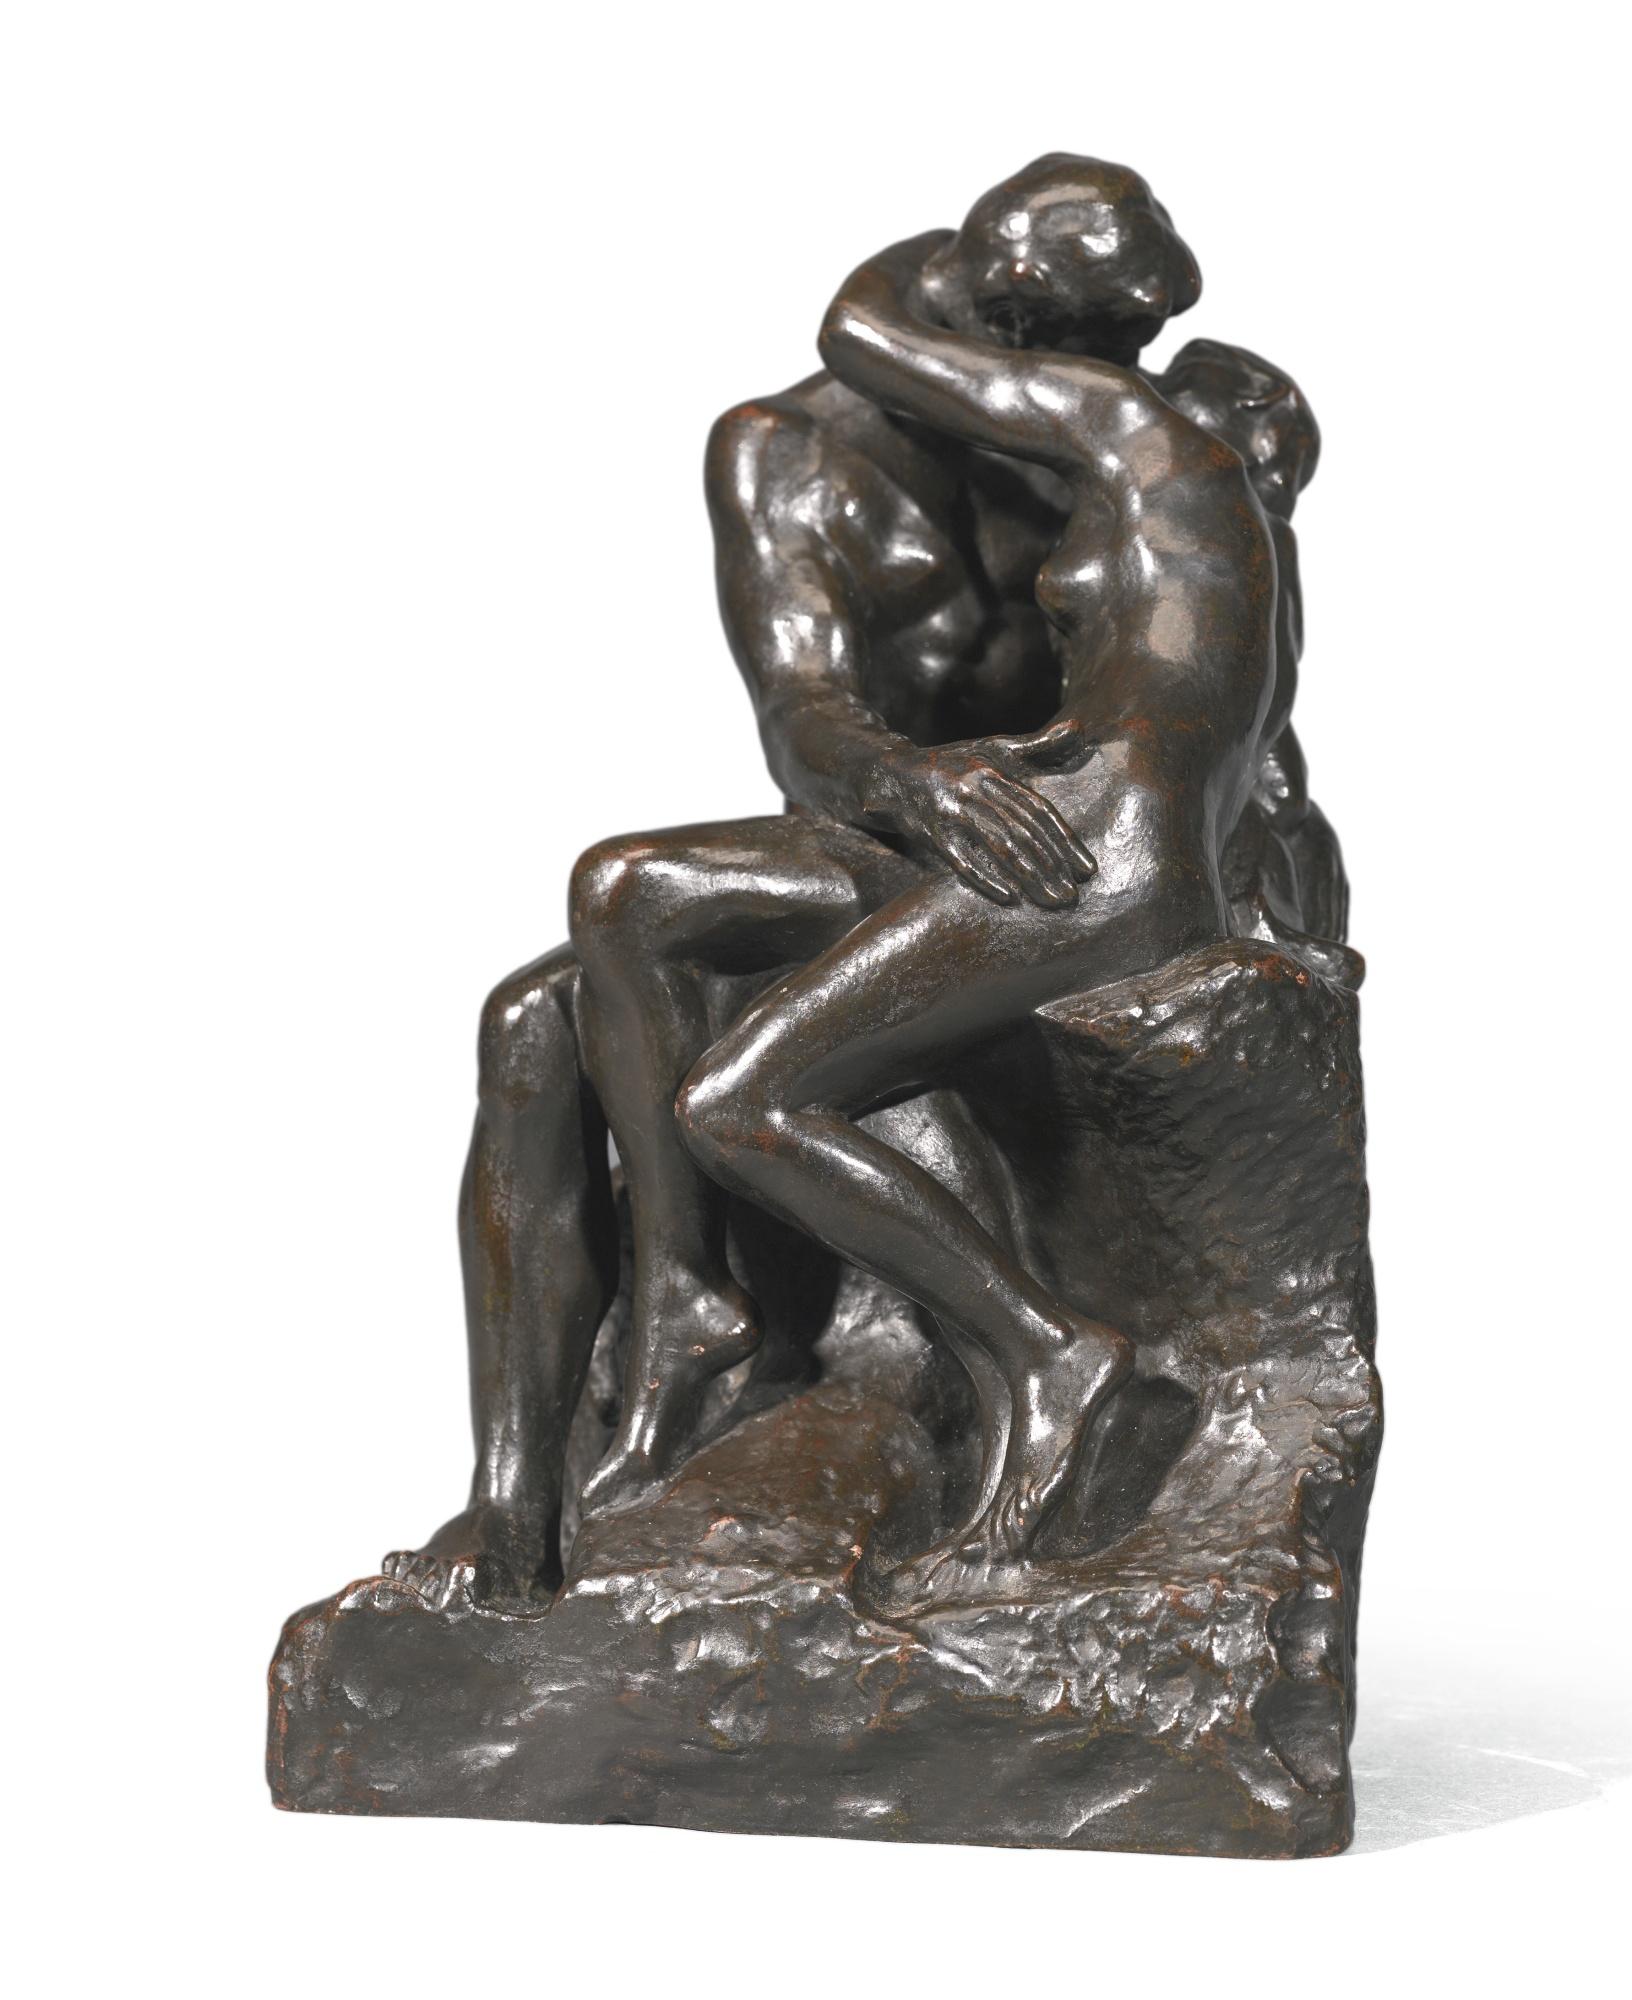 Auguste Rodin-Le Baiser, 4Eme Reduction Ou Petit Modele-1942